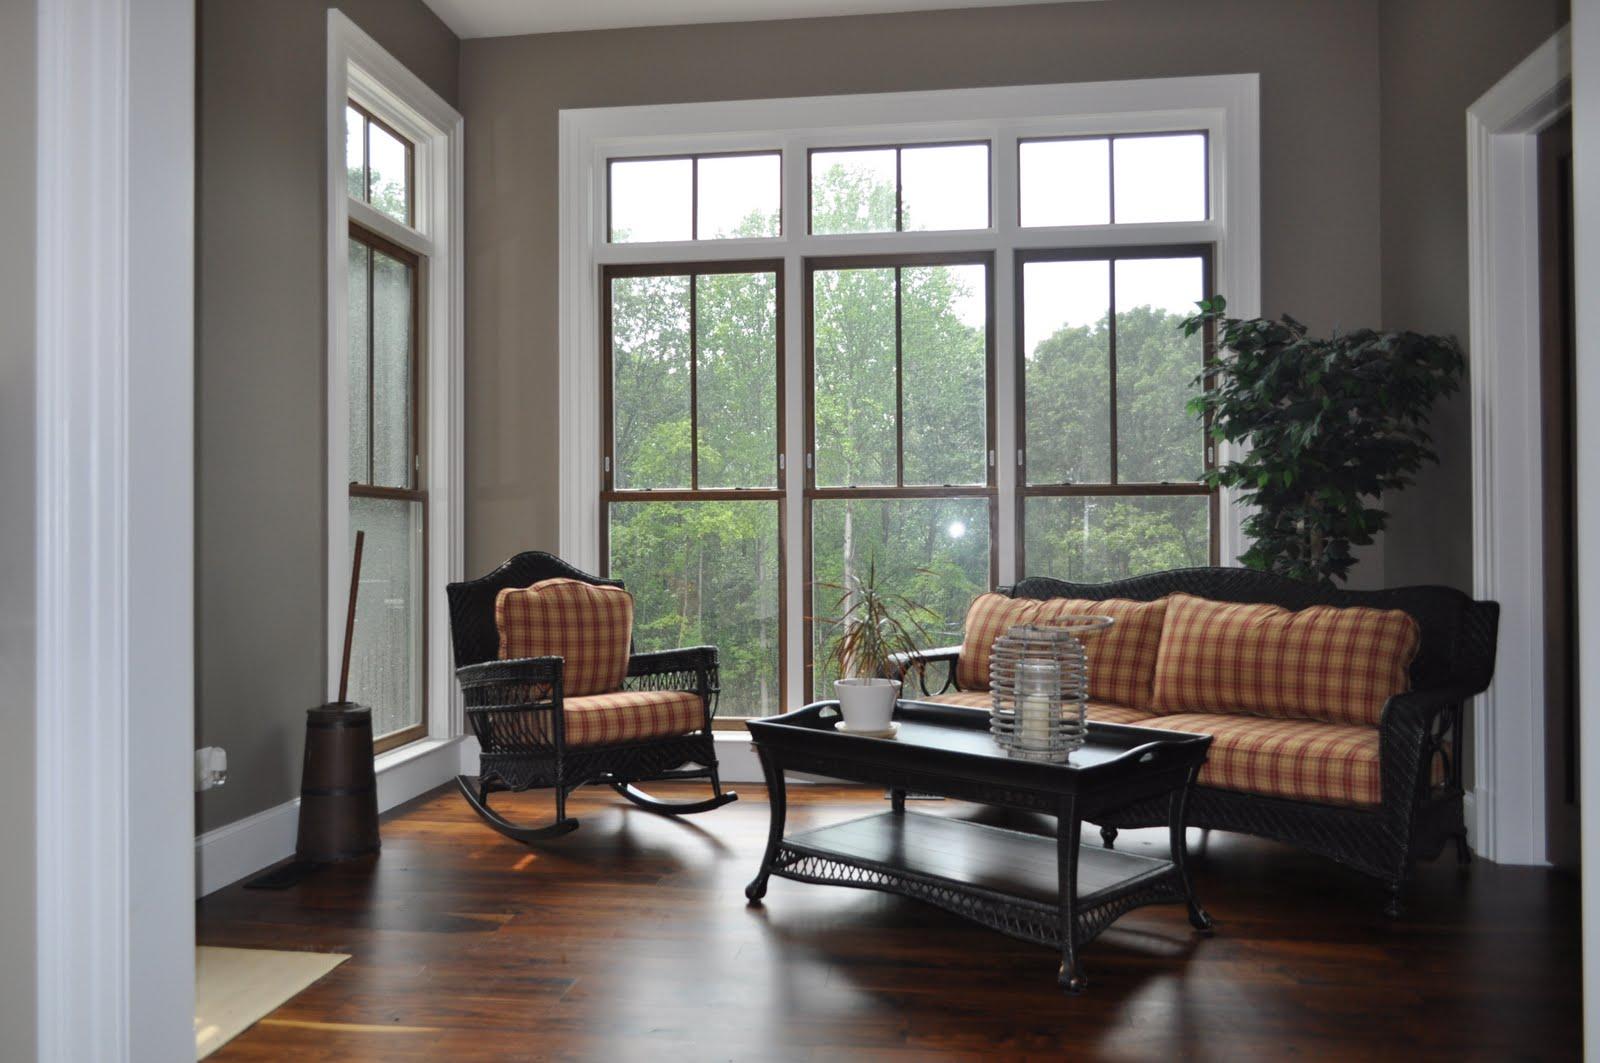 Grayce lane morning room project for Morning room designs